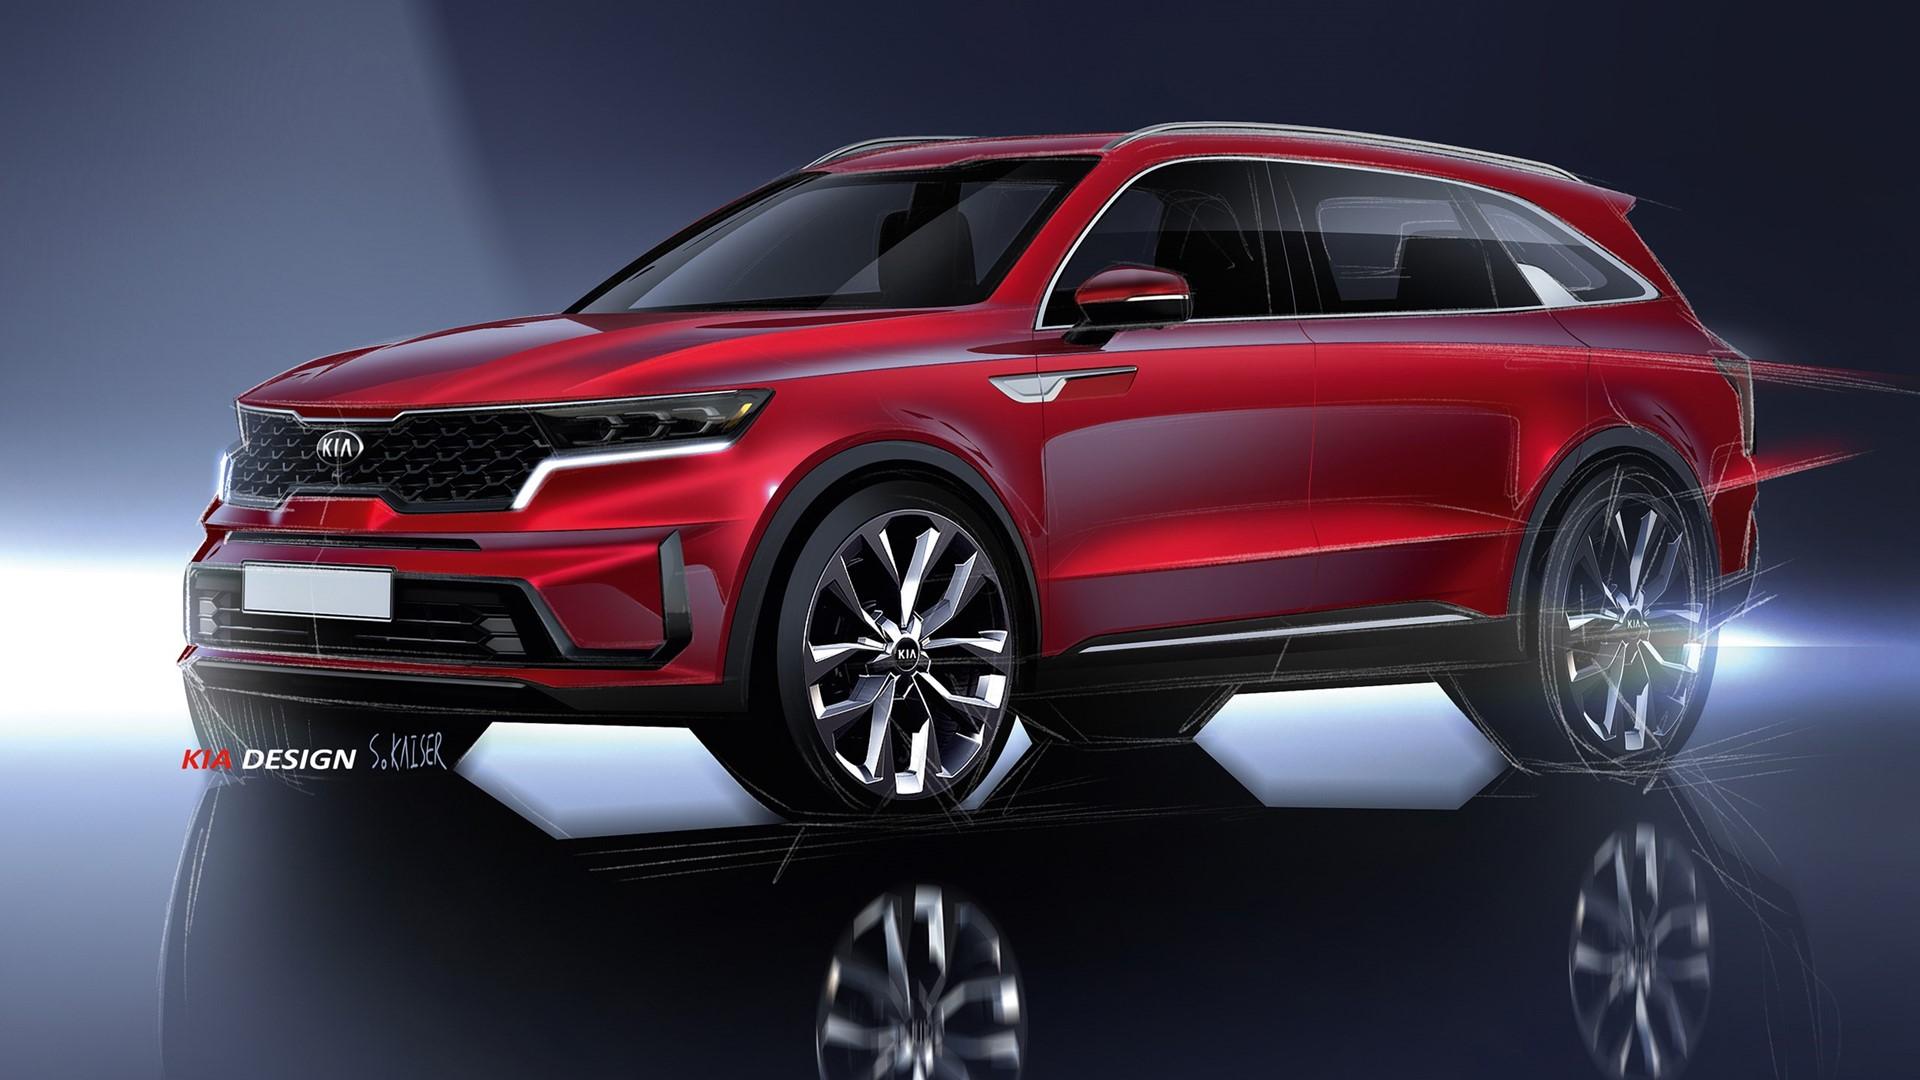 Powerful, progressive and versatile: the new Kia Sorento - Image 7